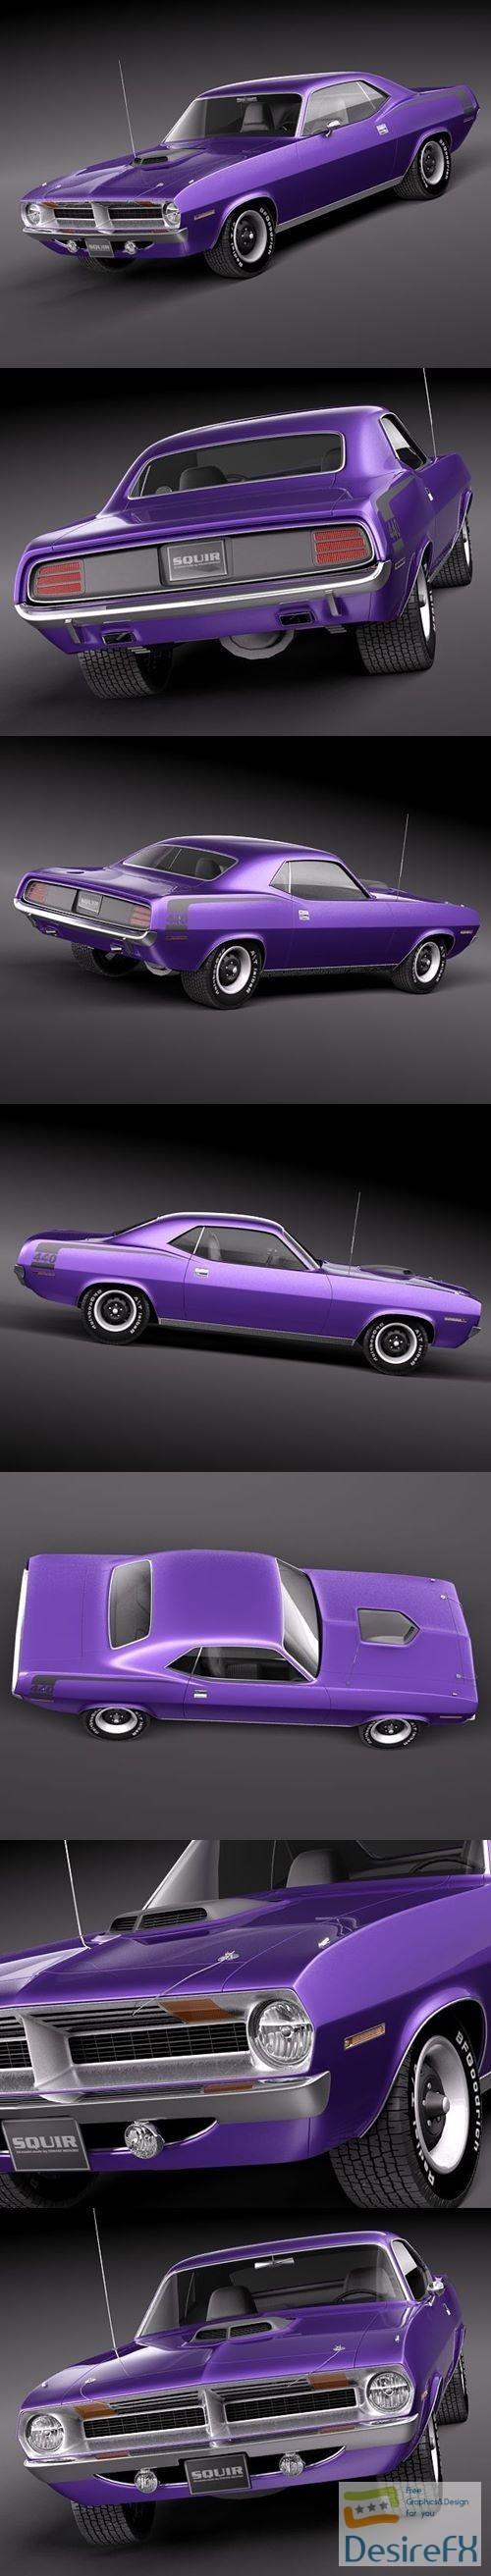 Desirefx com | Download Plymouth Hemi Cuda Barracuda 1971 3D Model